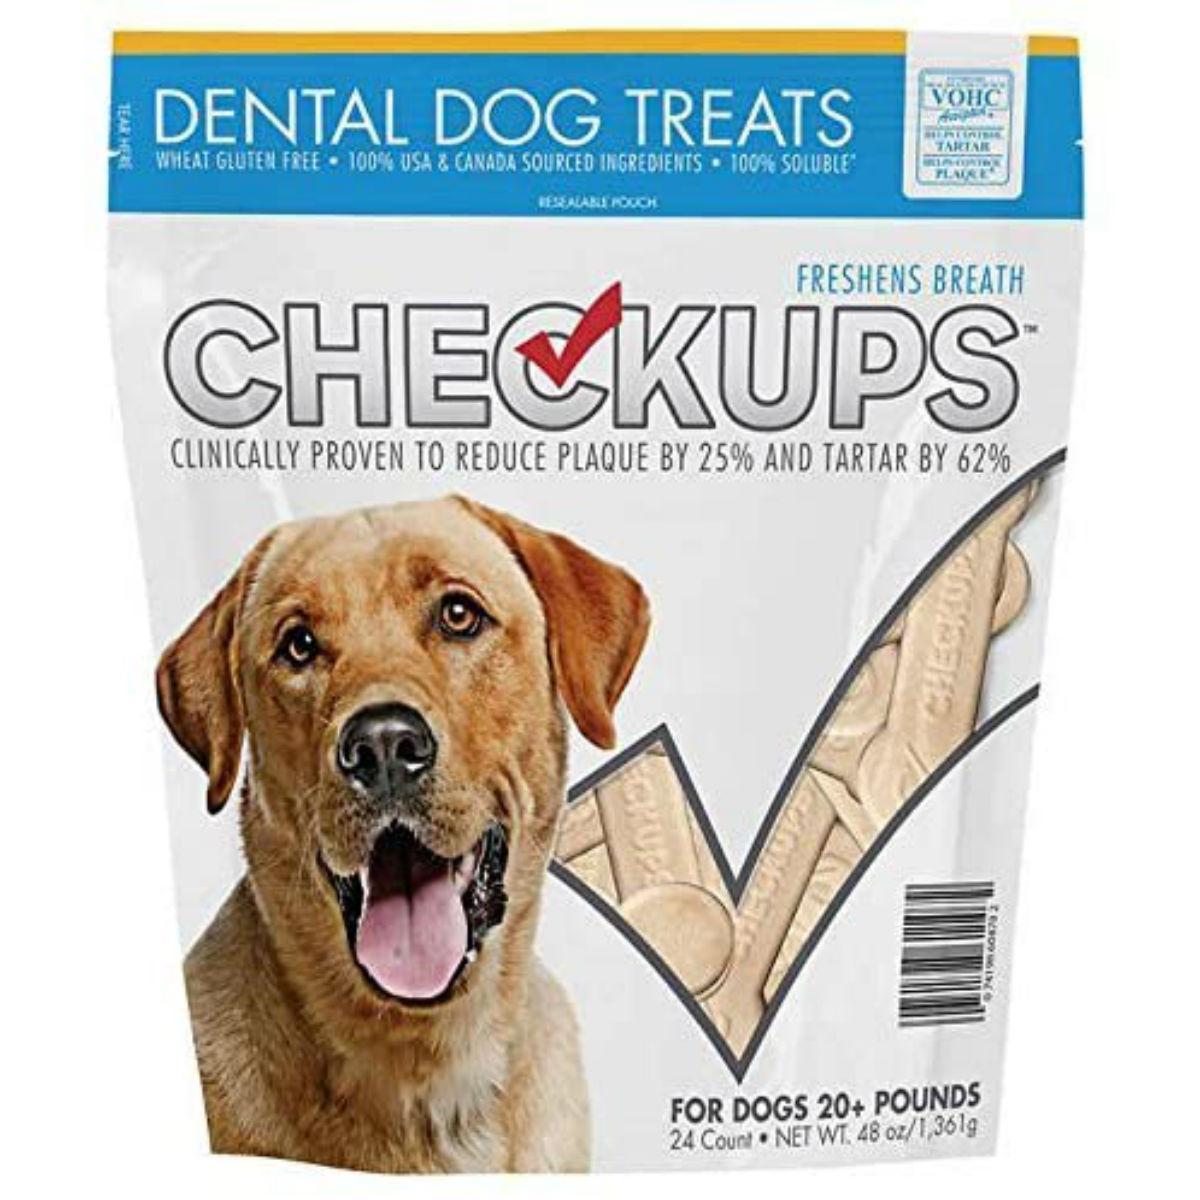 Checkups Dental Dog Treats